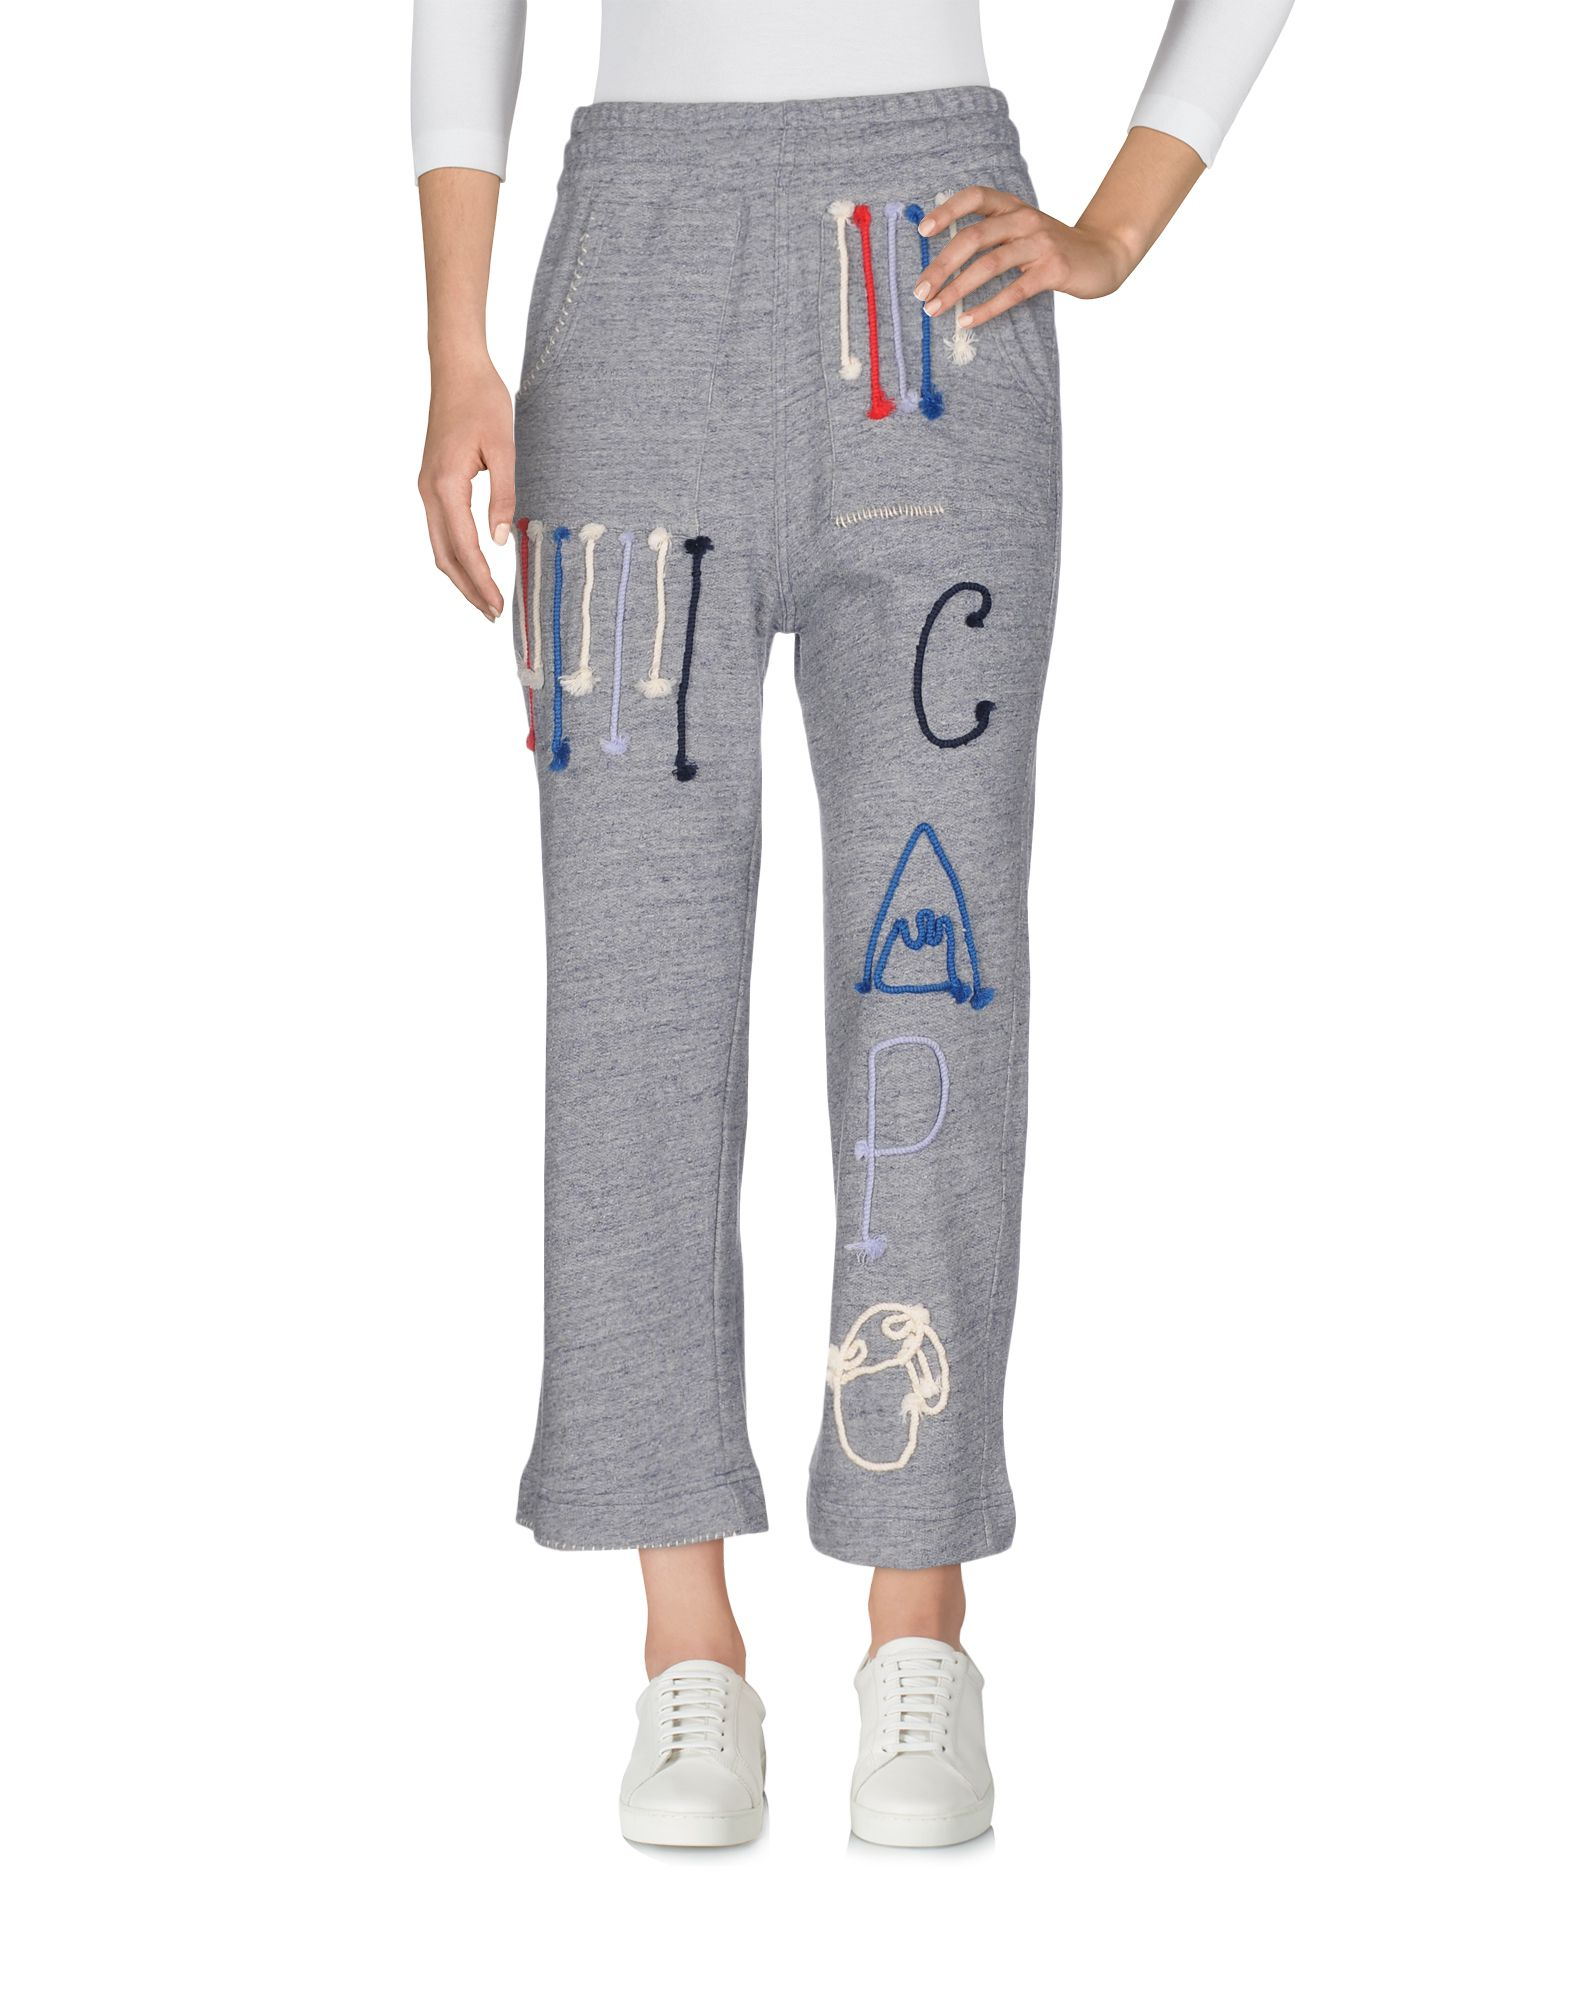 CAPE Casual Pants in Slate Blue